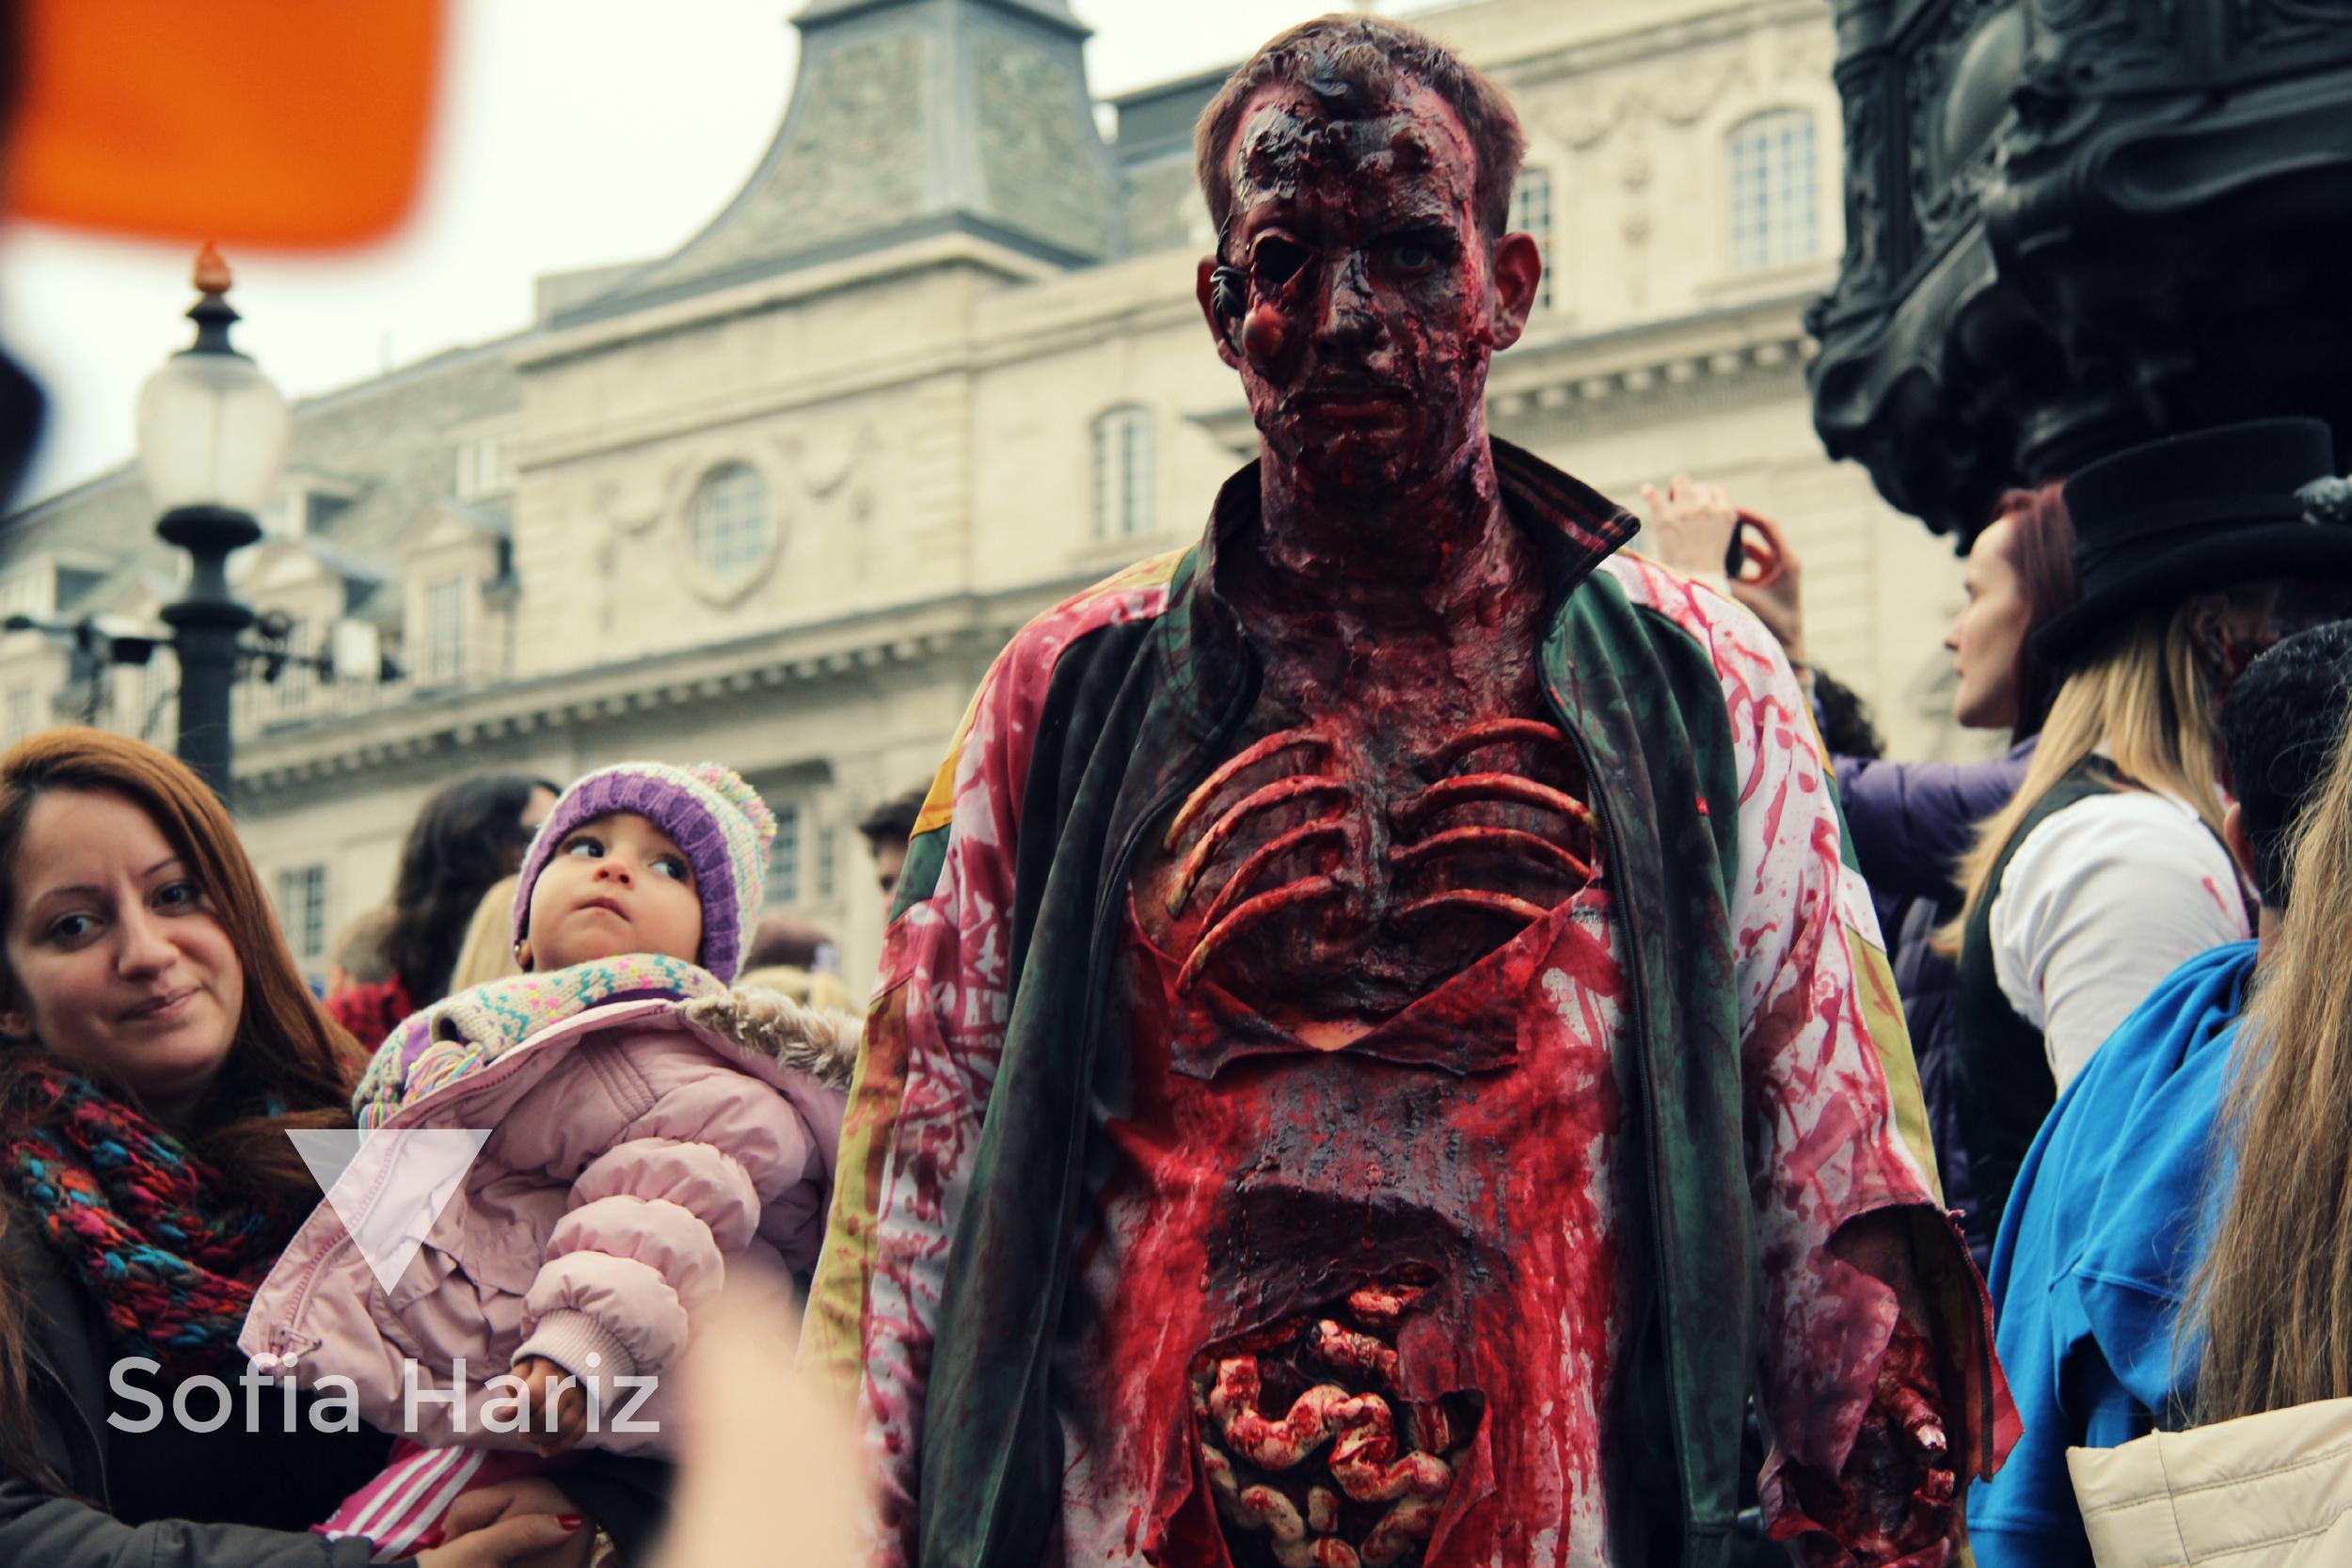 Guts - Zombie Walk 2013, London,UK